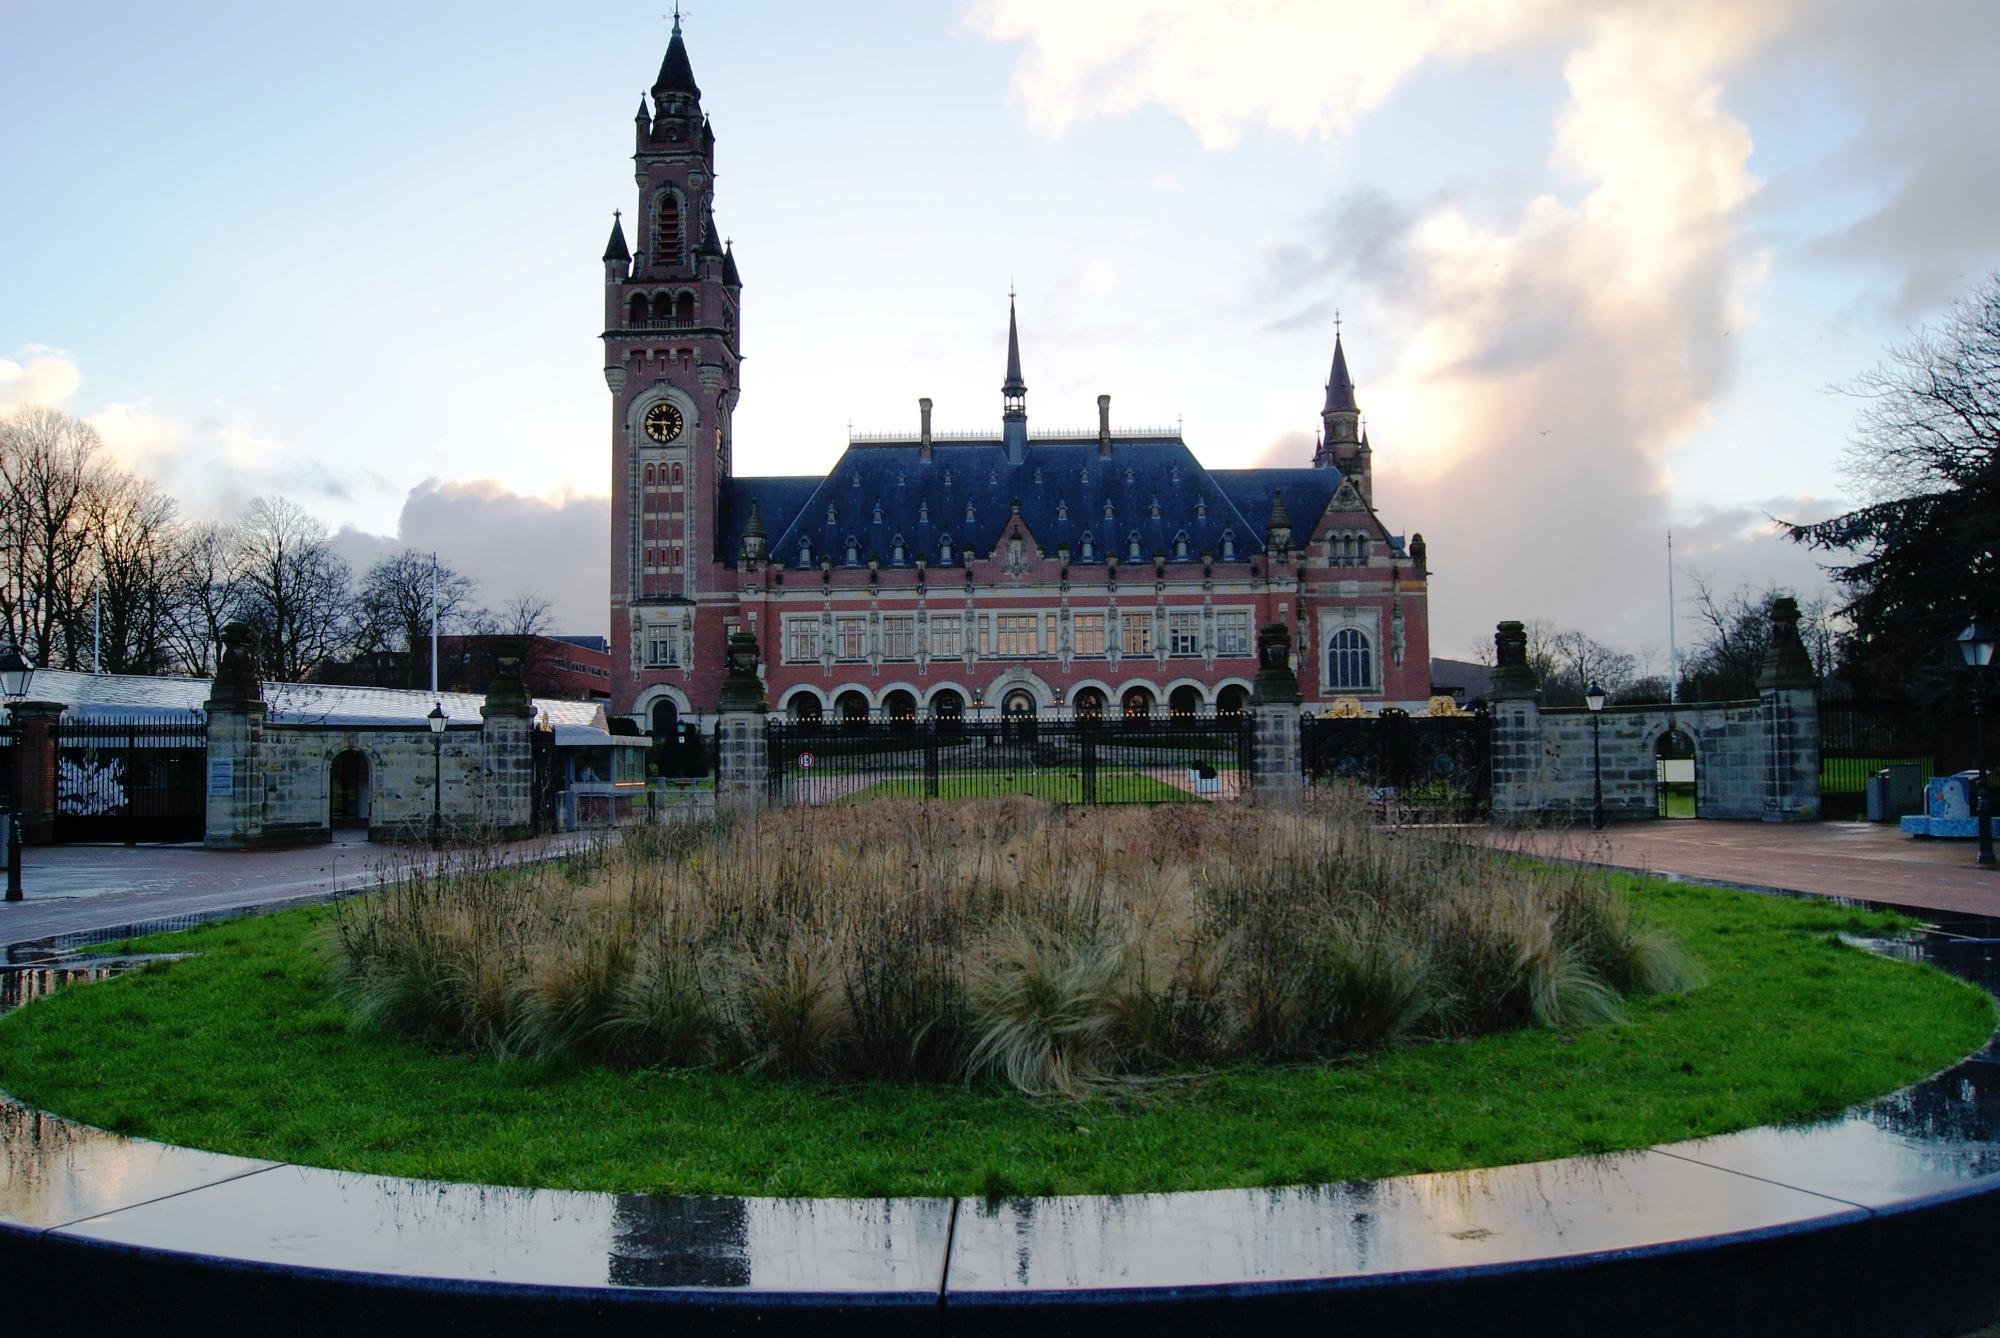 The Hague-Peace Palace